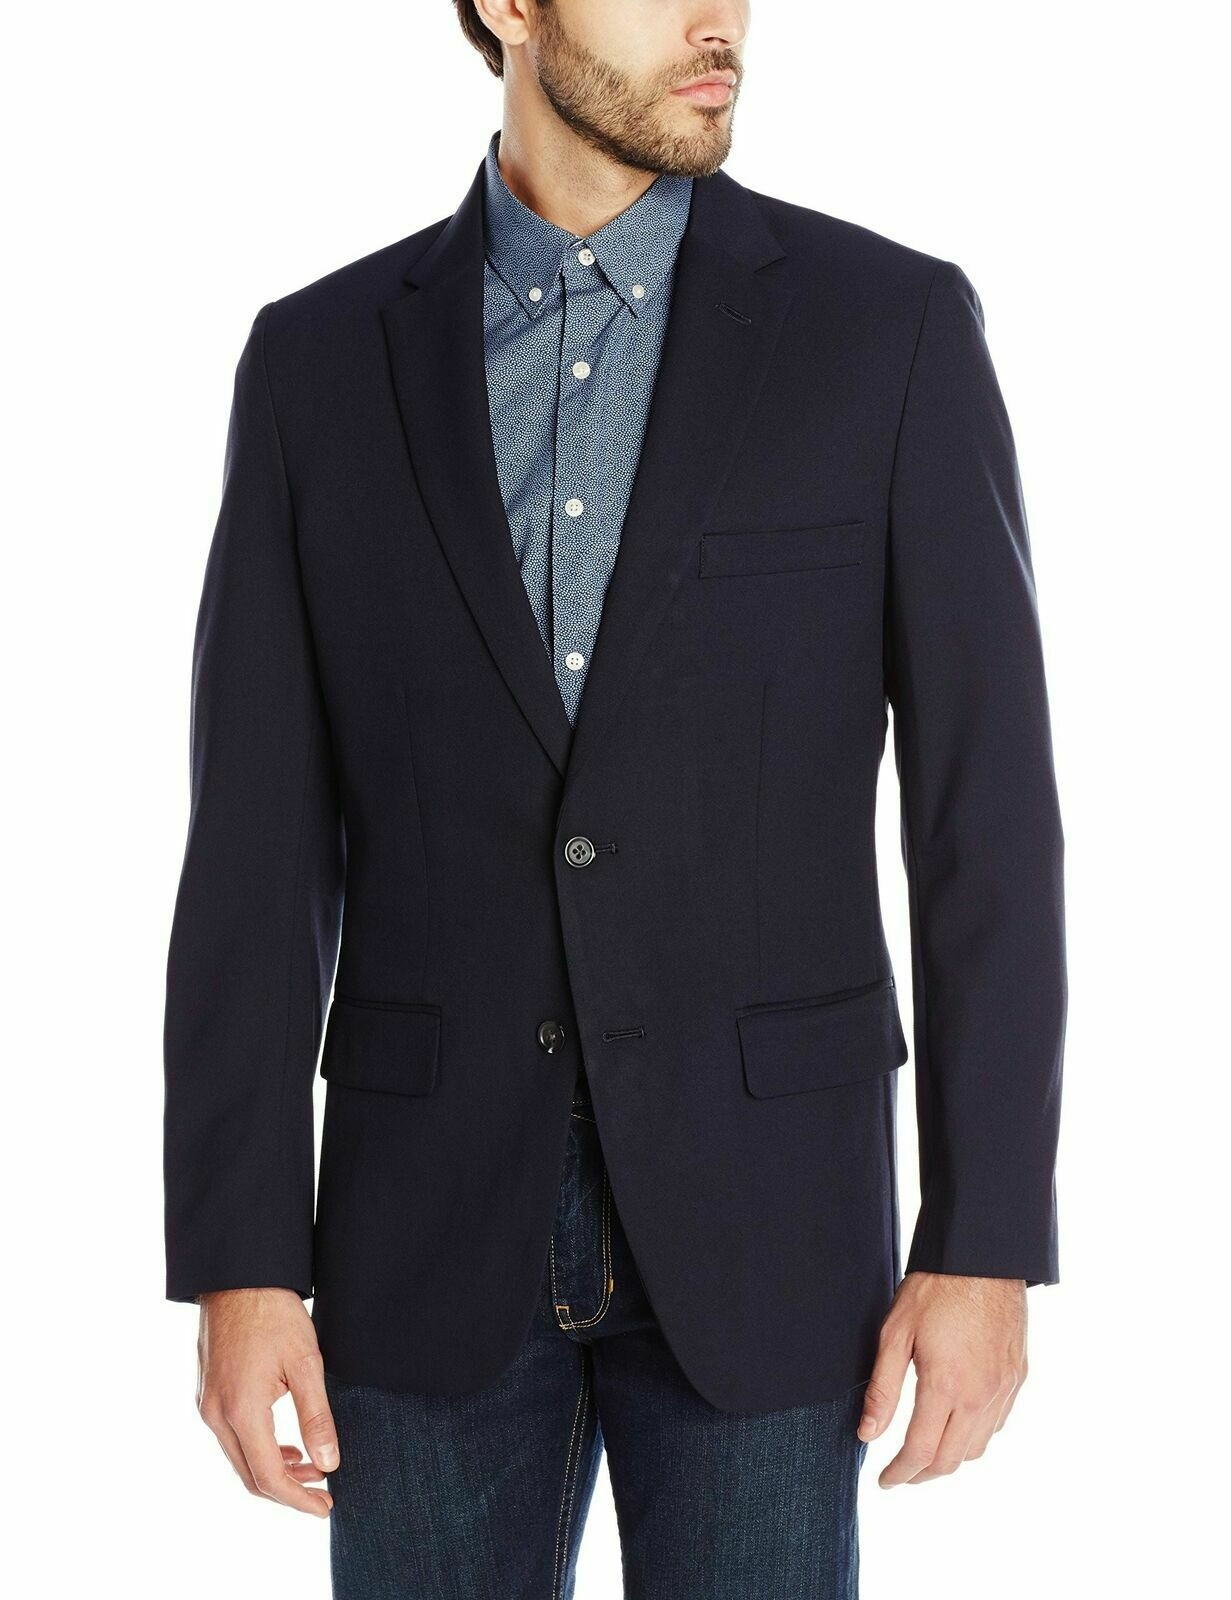 Haggar Men's Tailored Fit In Motion Blazer, 40 Long, Midnight bluee, HJ10337 Nwt